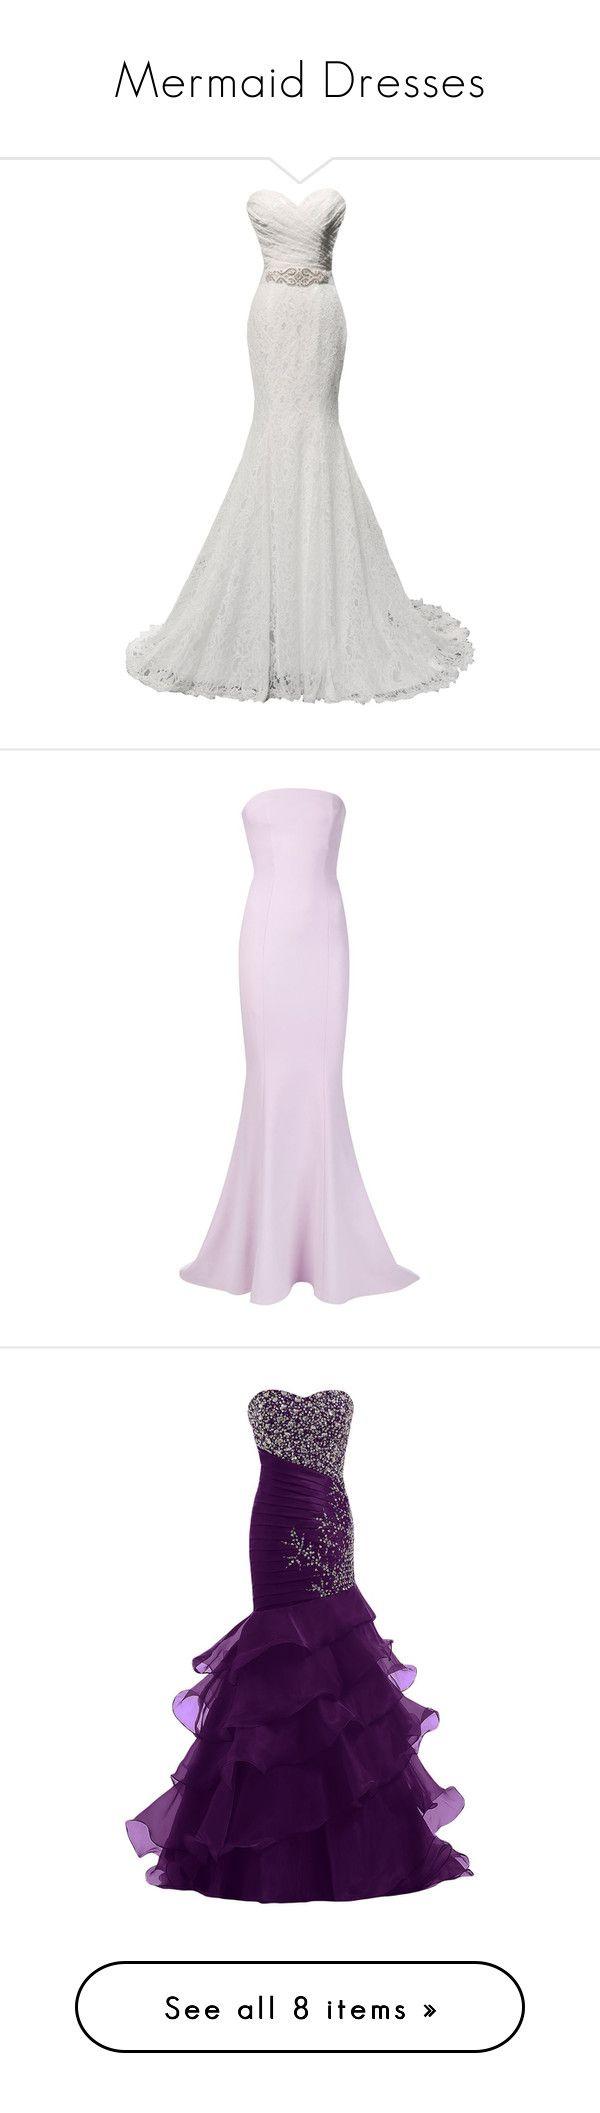 Mermaid Wedding Dresses Polyvore : Quot mermaid dresses by hudsyrocks liked on polyvore